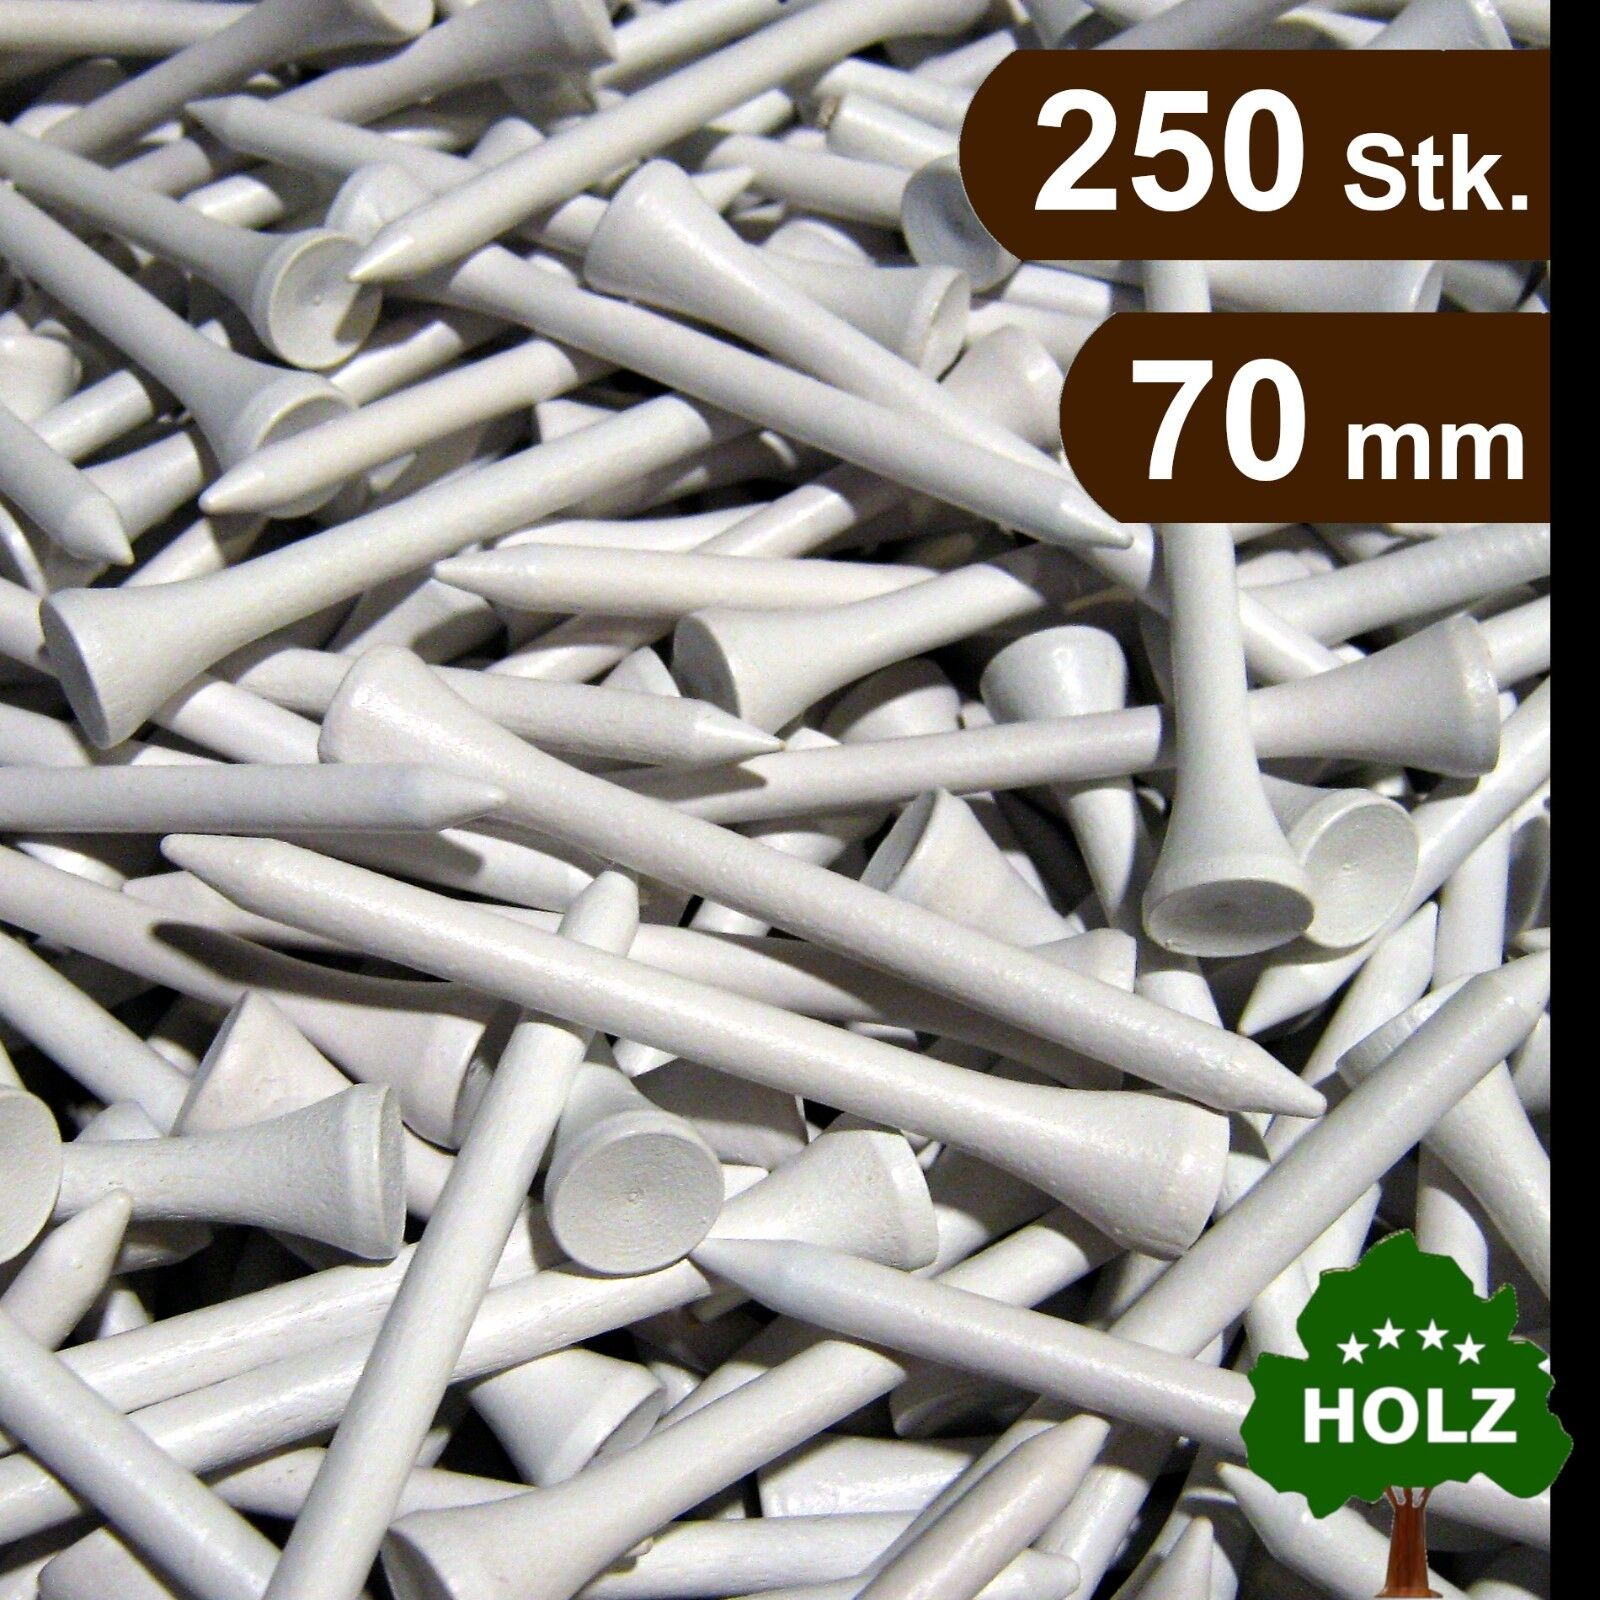 Golf Tees / Holz Tees / 70 mm / 250 Stk. / weiß / premium Qualität / Top Preis!